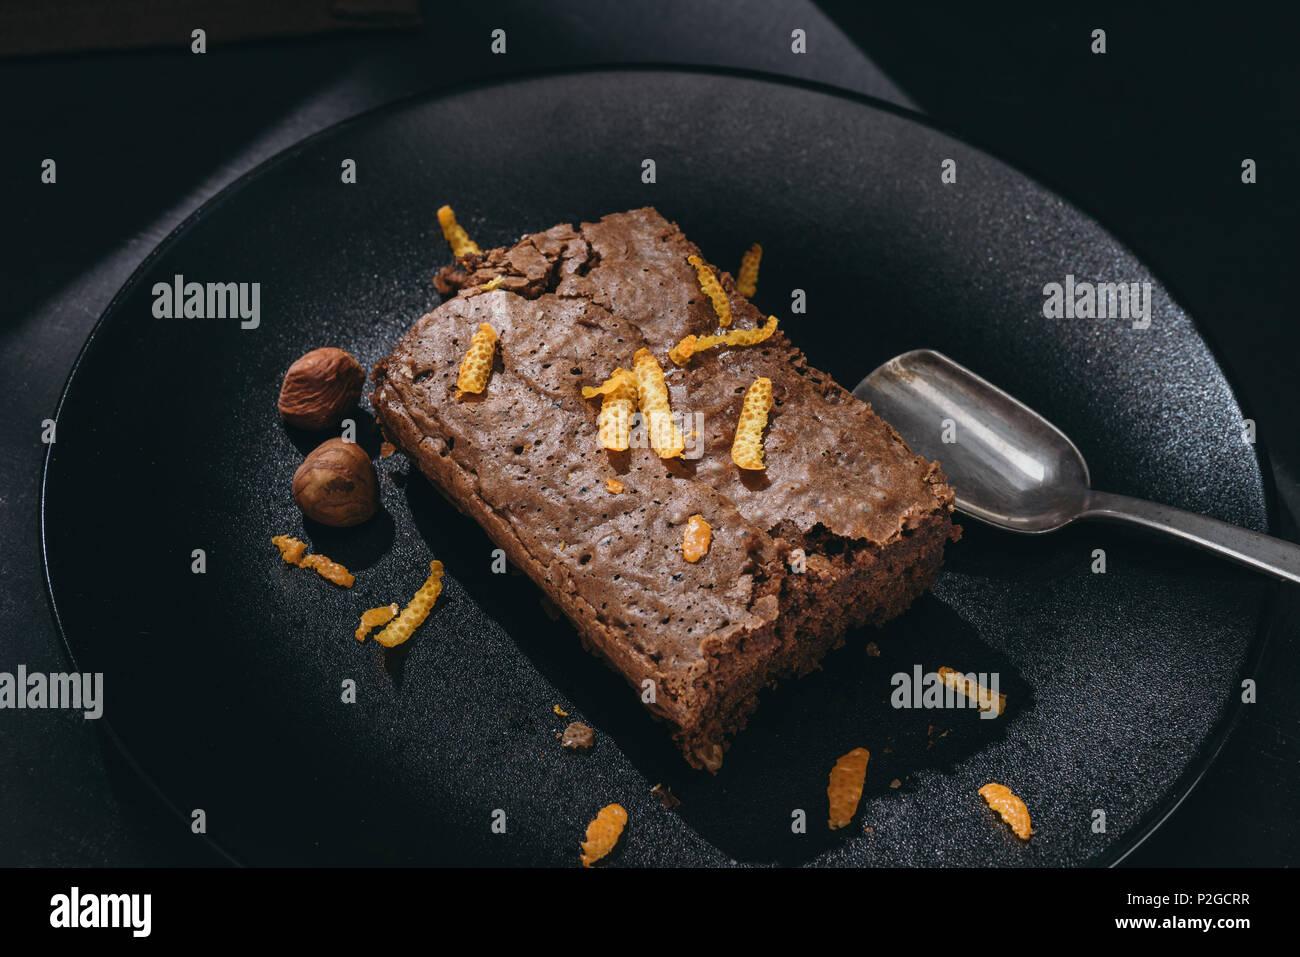 close-up shot of chocolate cake with orange zest on black plate - Stock Image